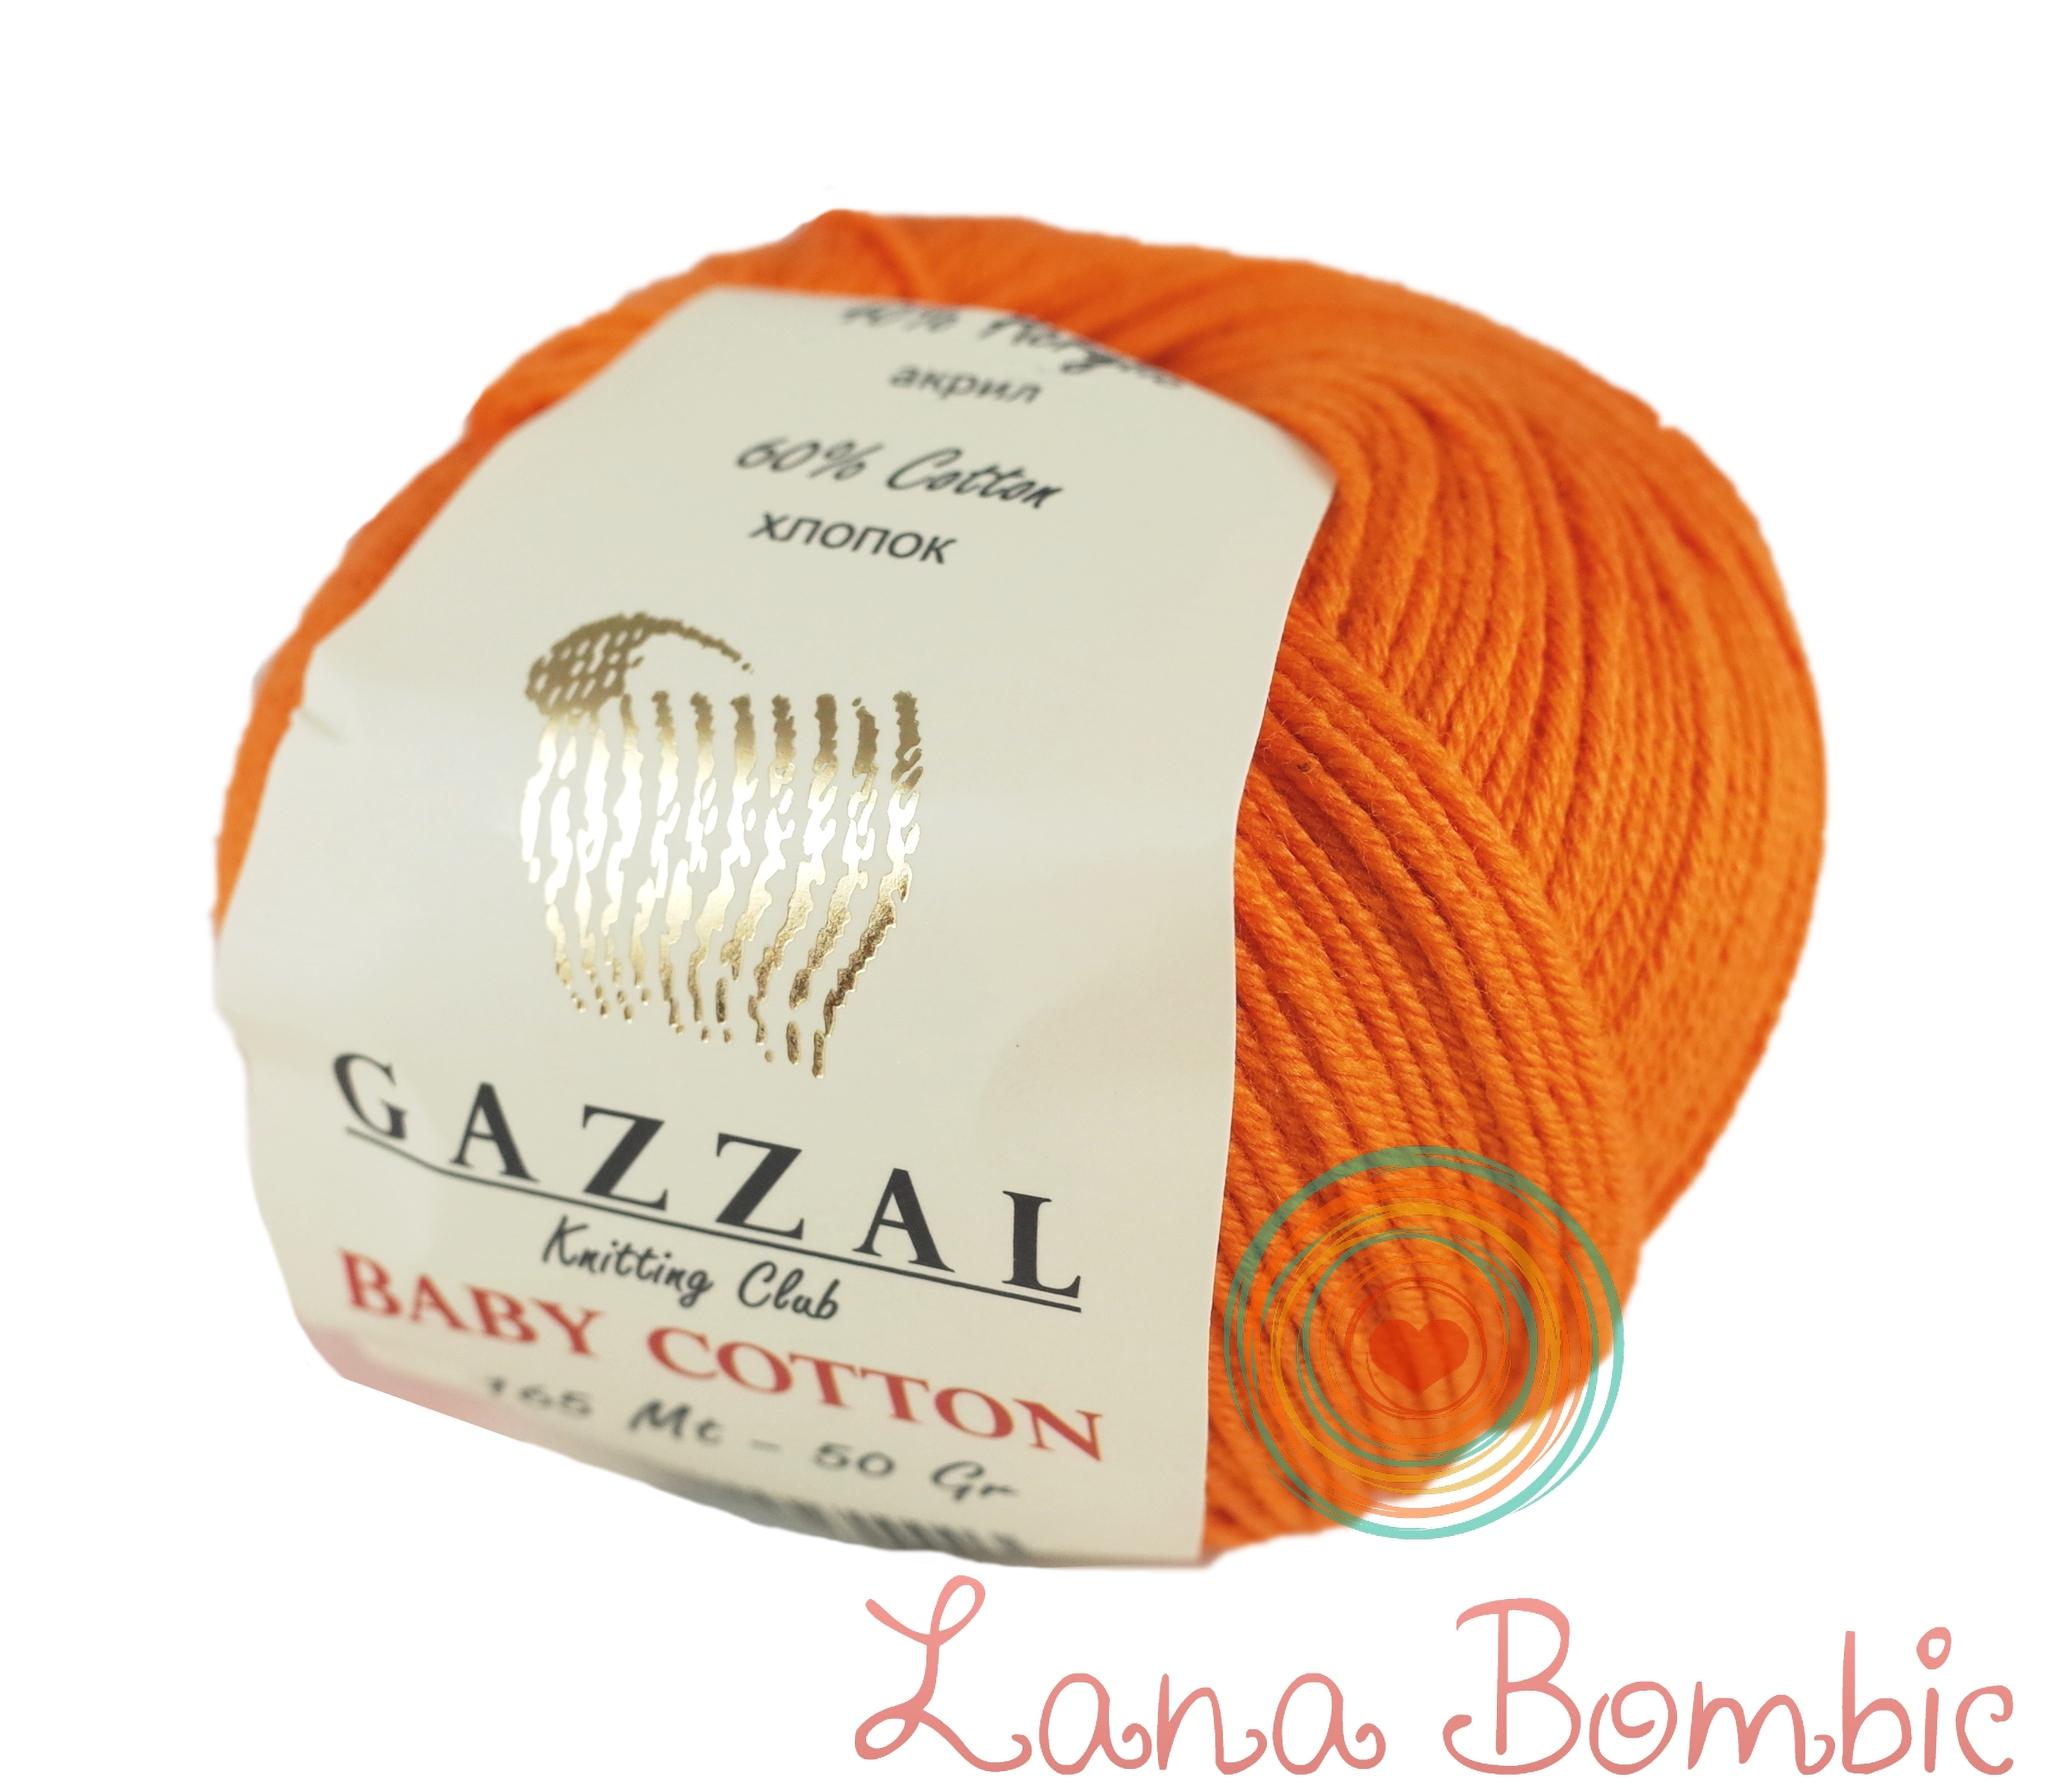 Пряжа Gazzal Baby Cotton 3419 оранжевый